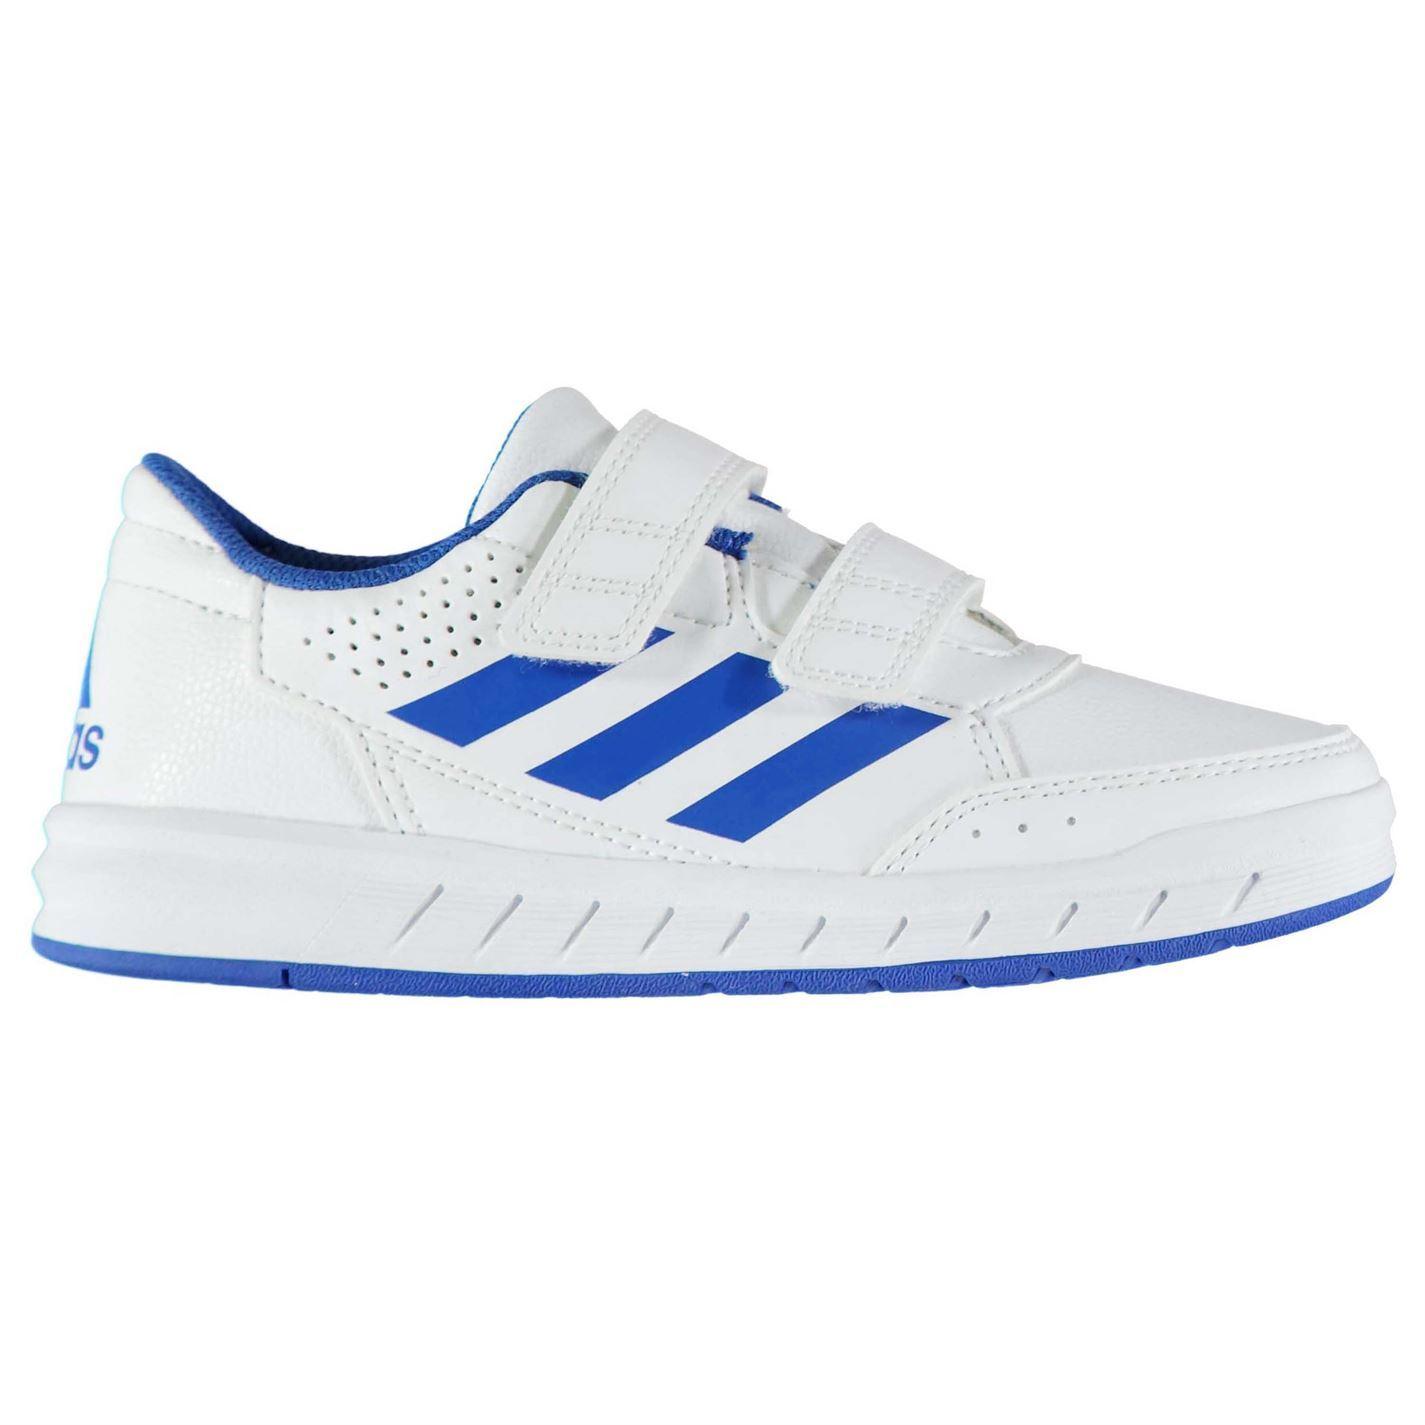 miniatura 14 - ADIDAS-alta-Sport-CF-Scarpe-da-ginnastica-bambino-ragazzo-calzature